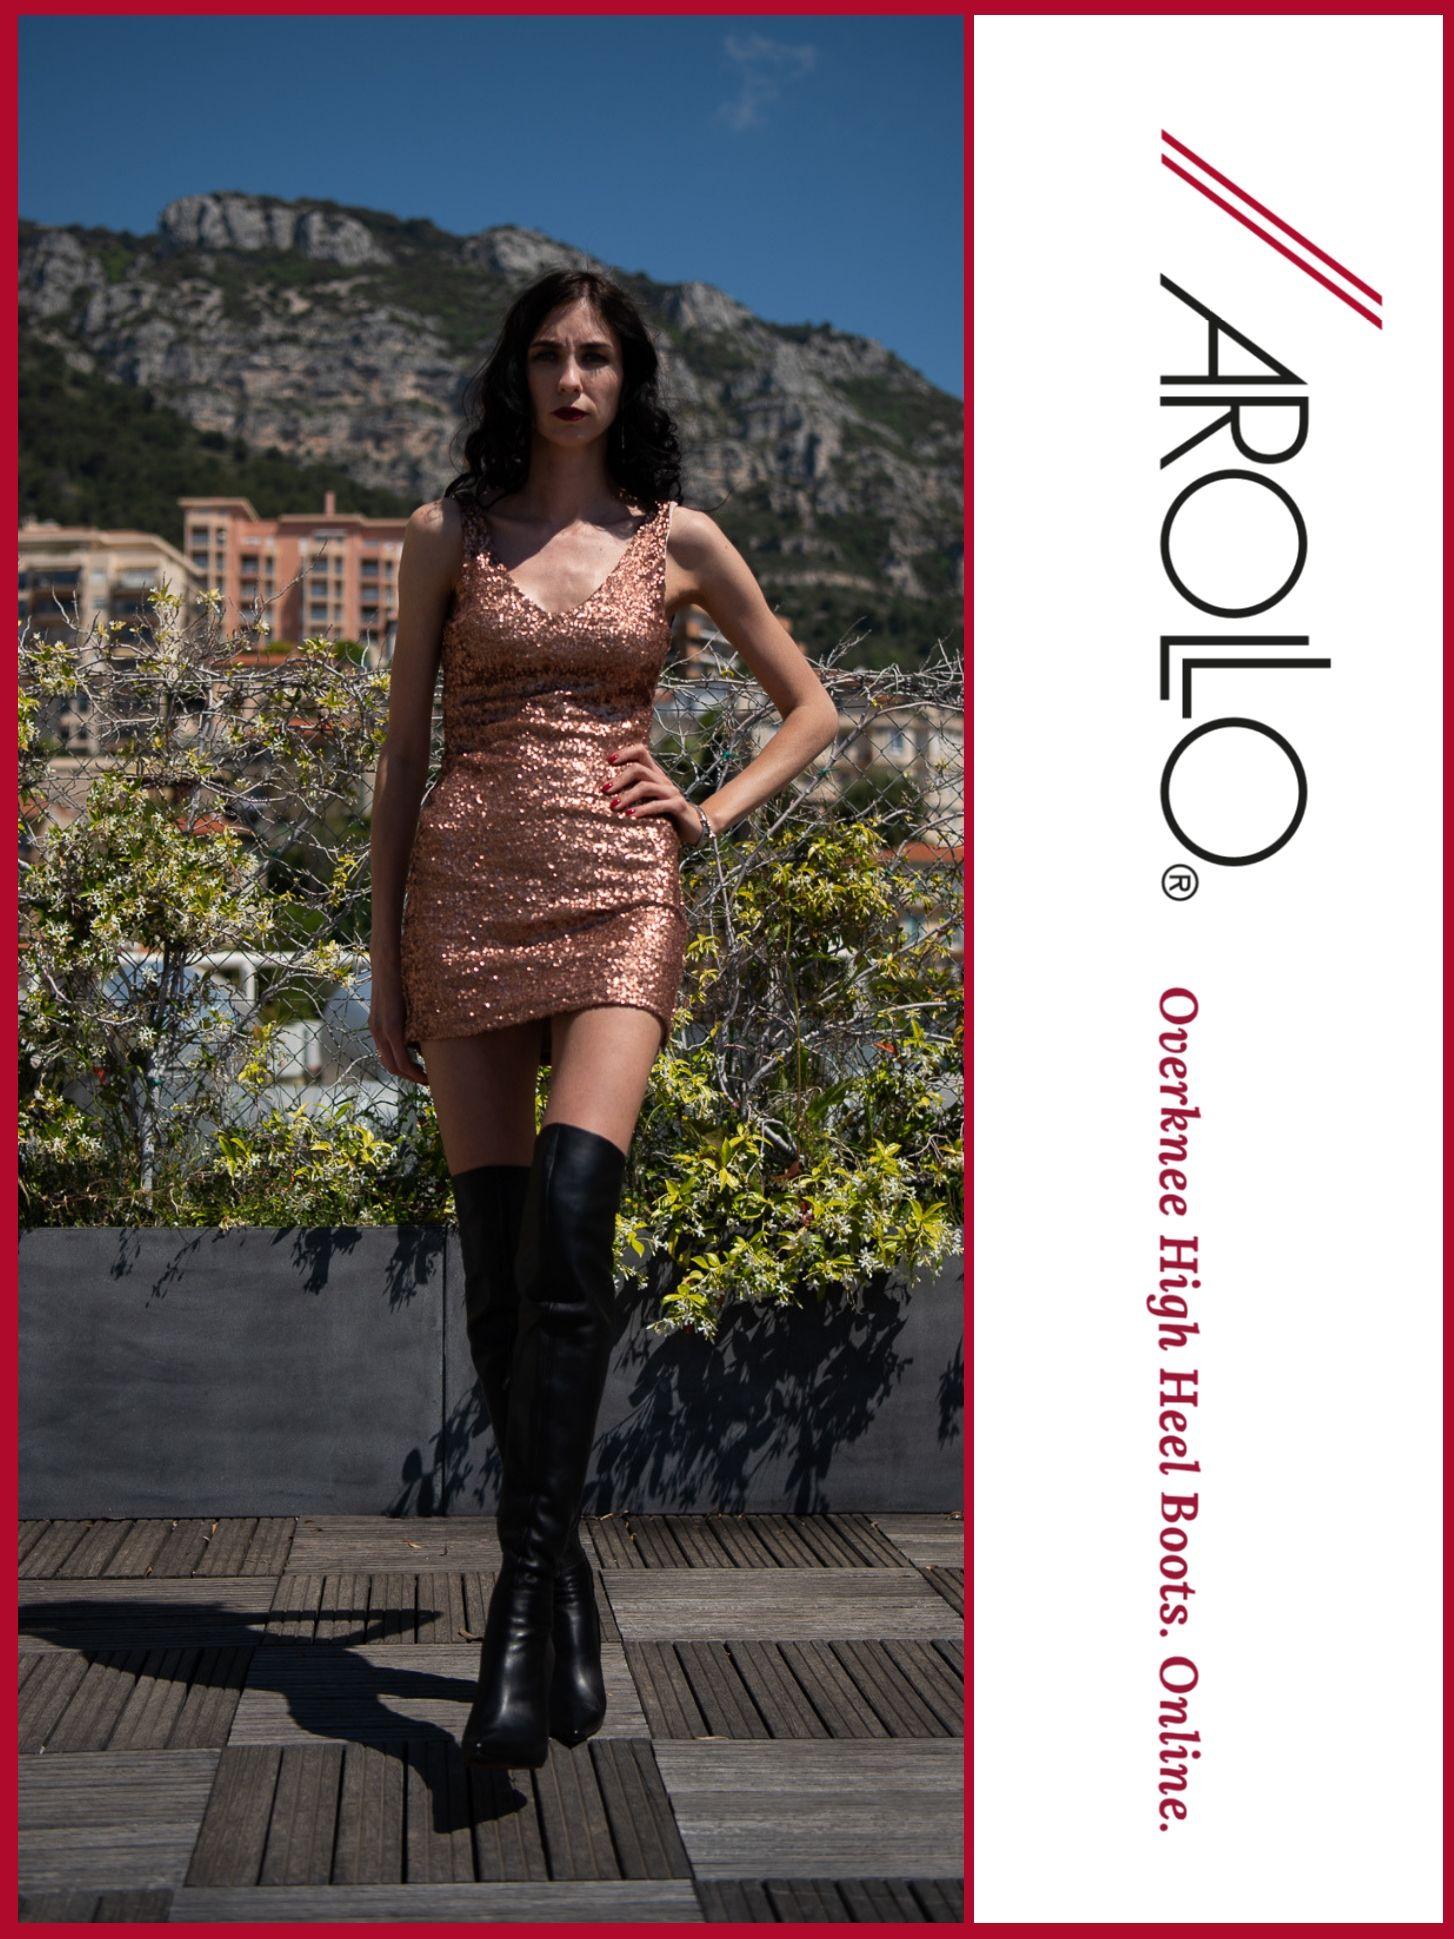 AROLLO Thigh High Boots Stiletto Roma overknee stiefel